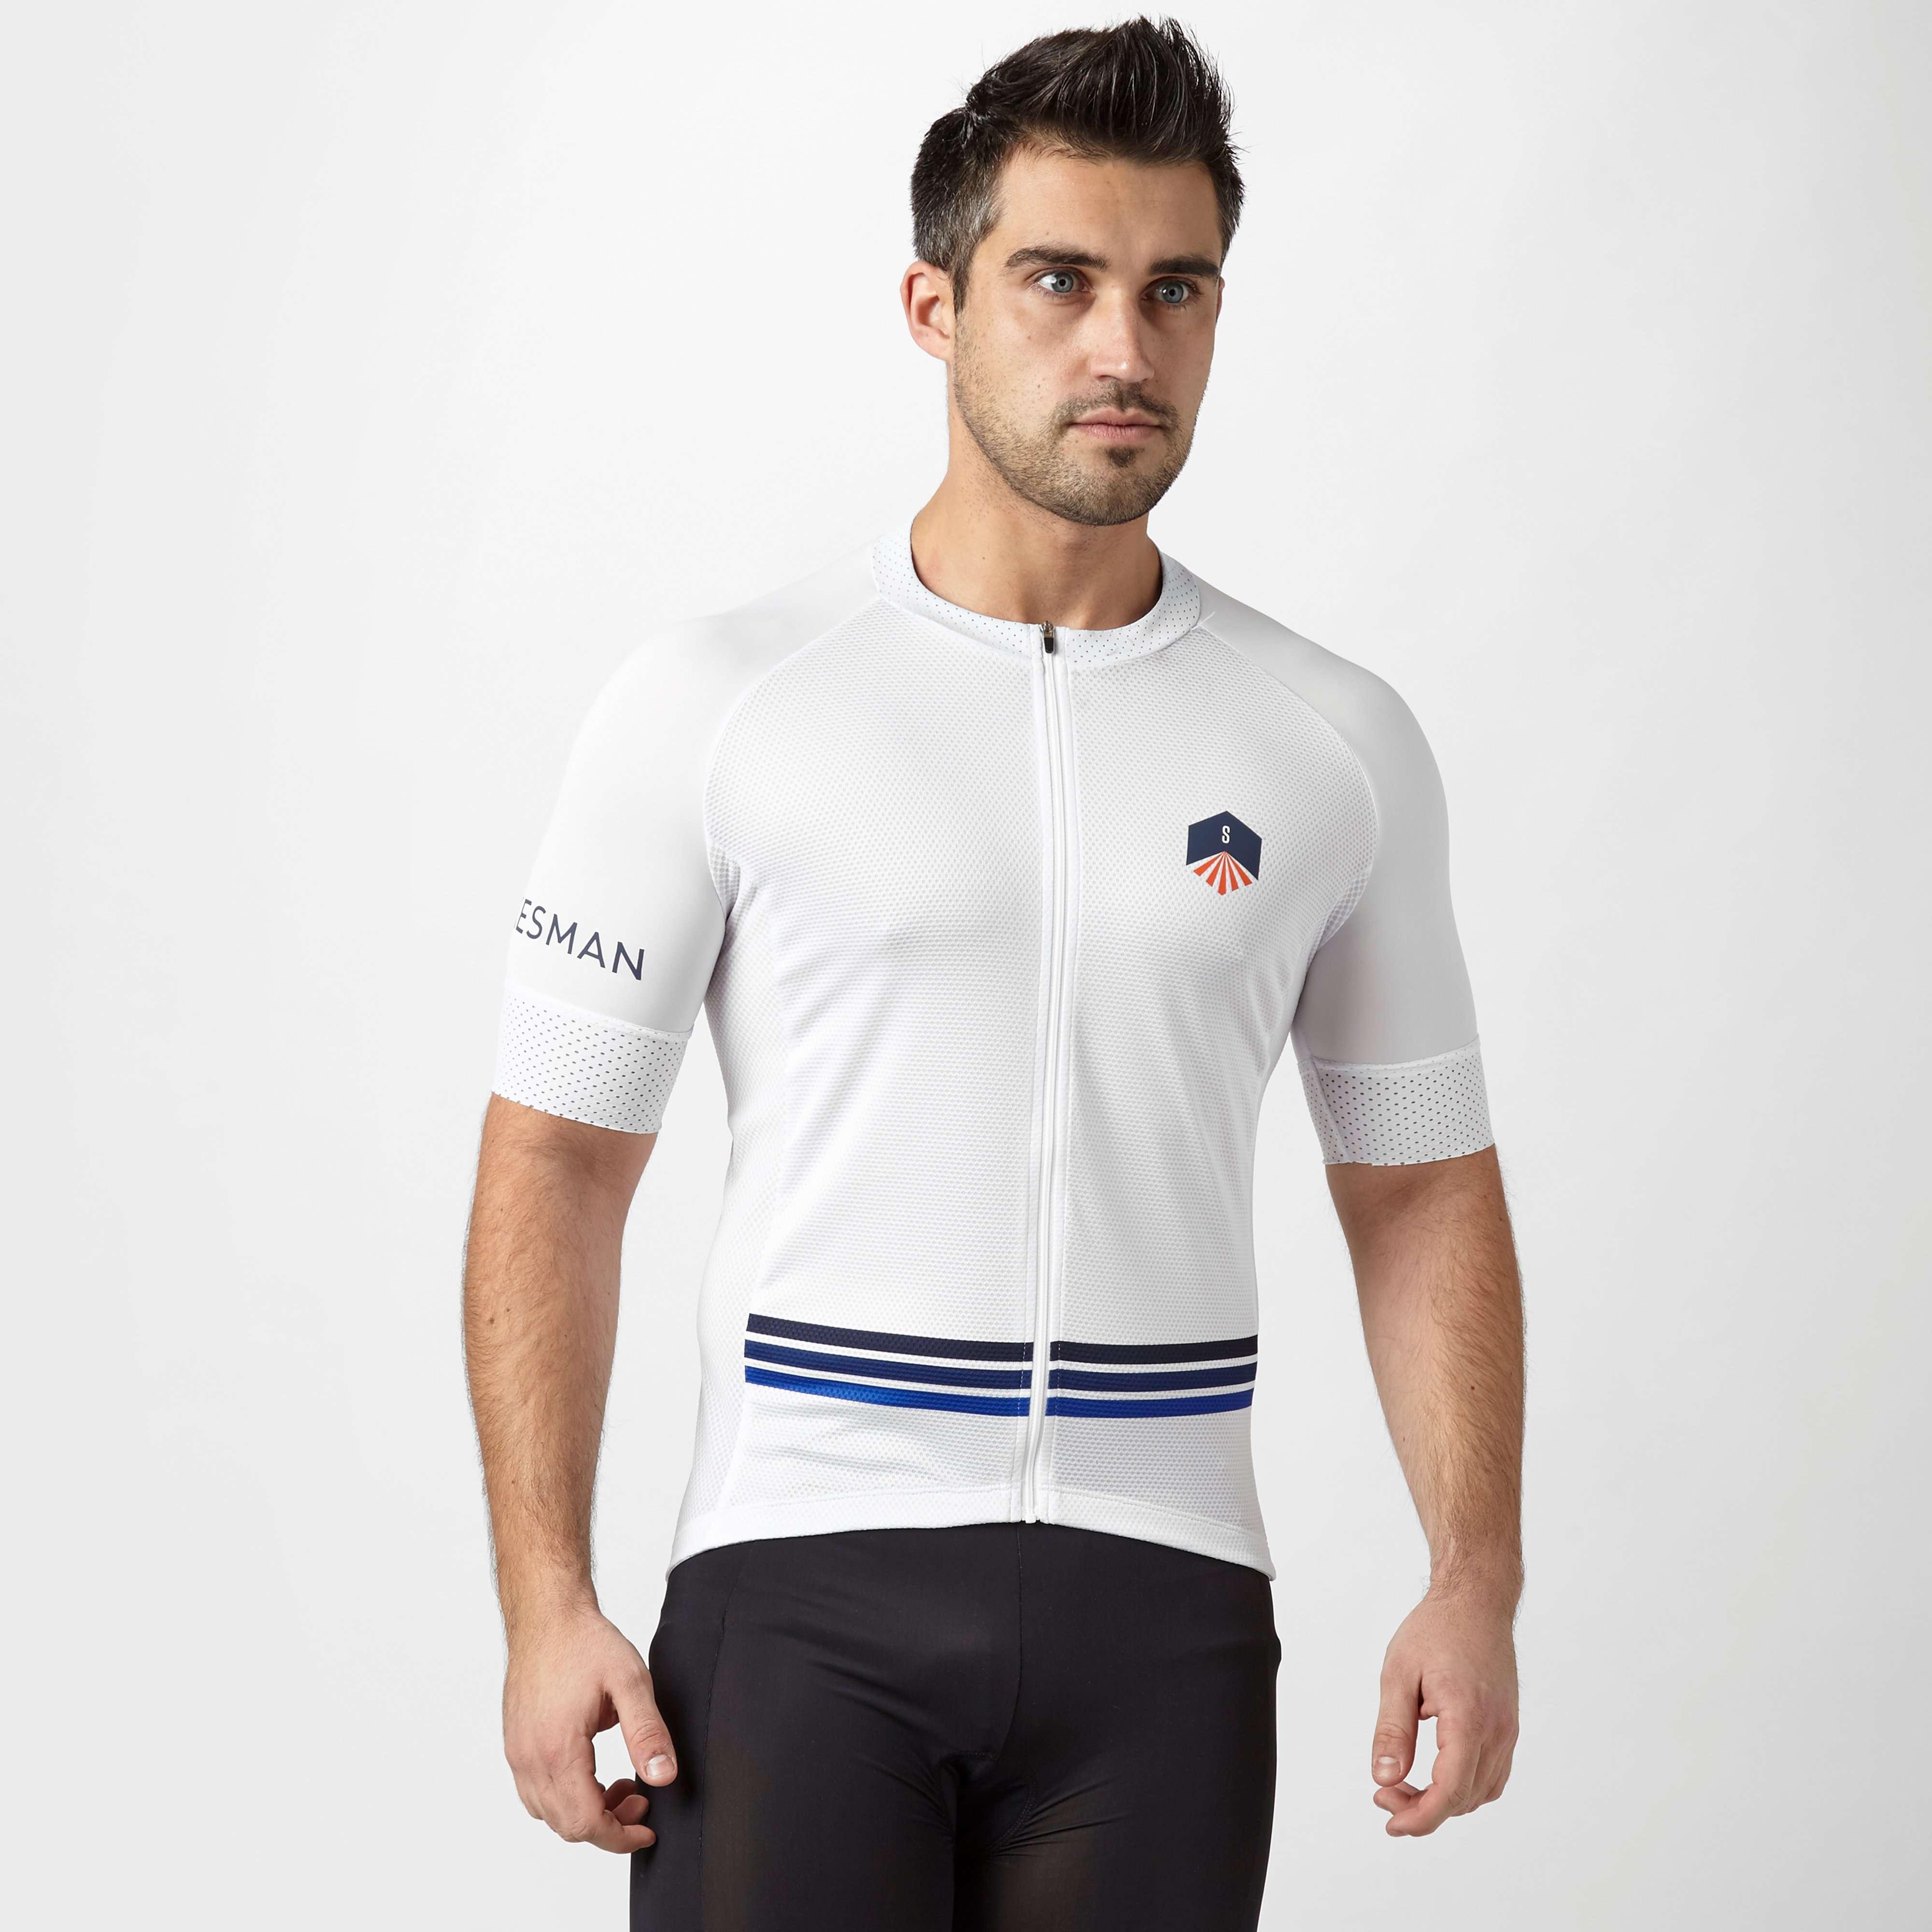 SPOKESMAN Men's Climbers Cycling Jersey